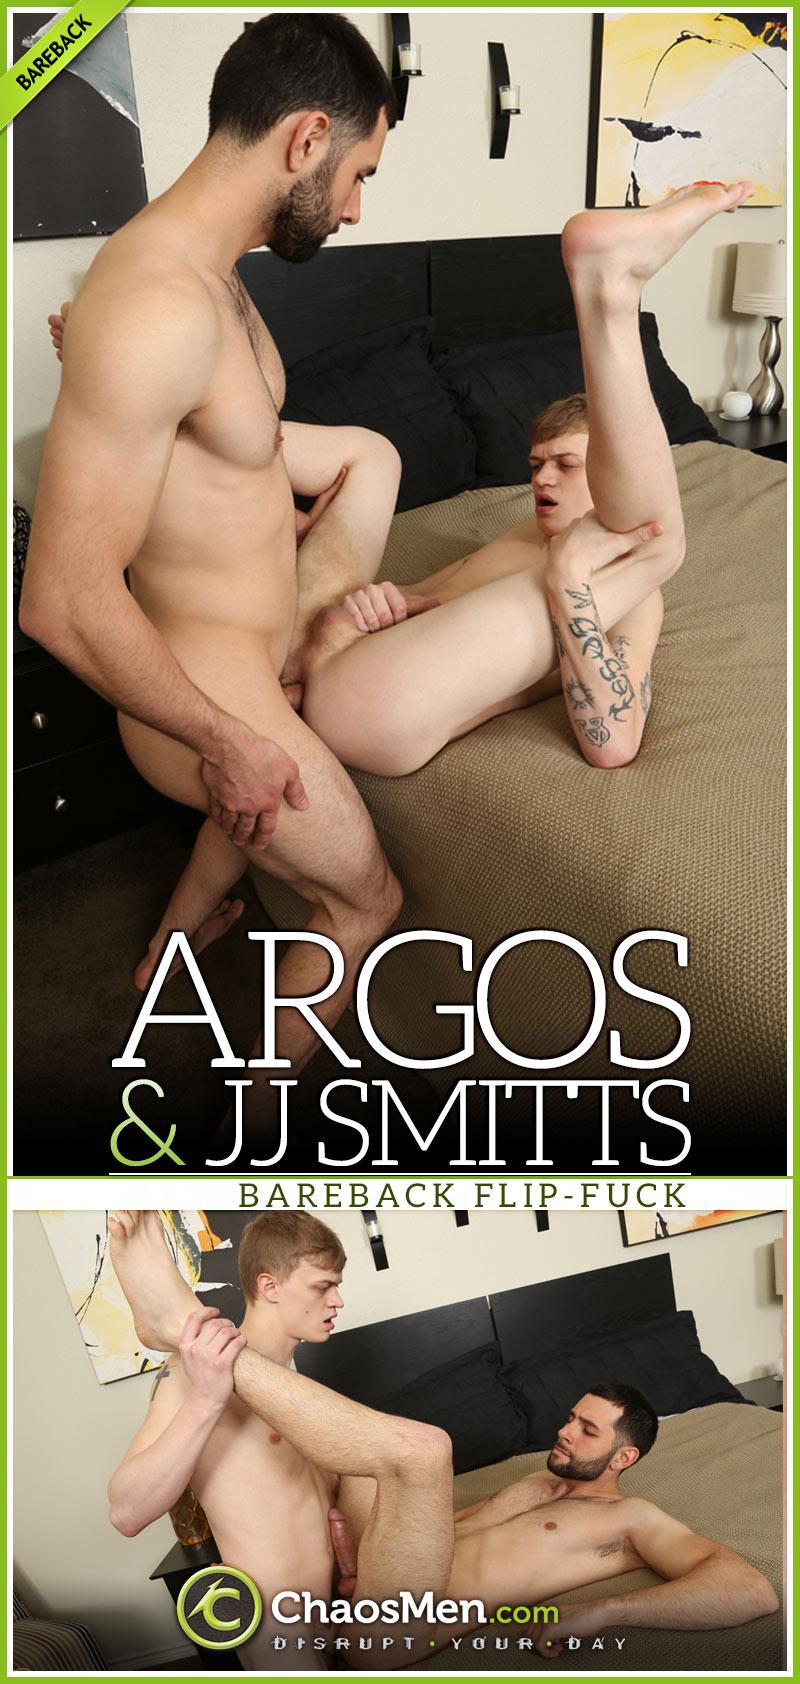 Argos & JJ Smitts Flip-Fuck at ChaosMen